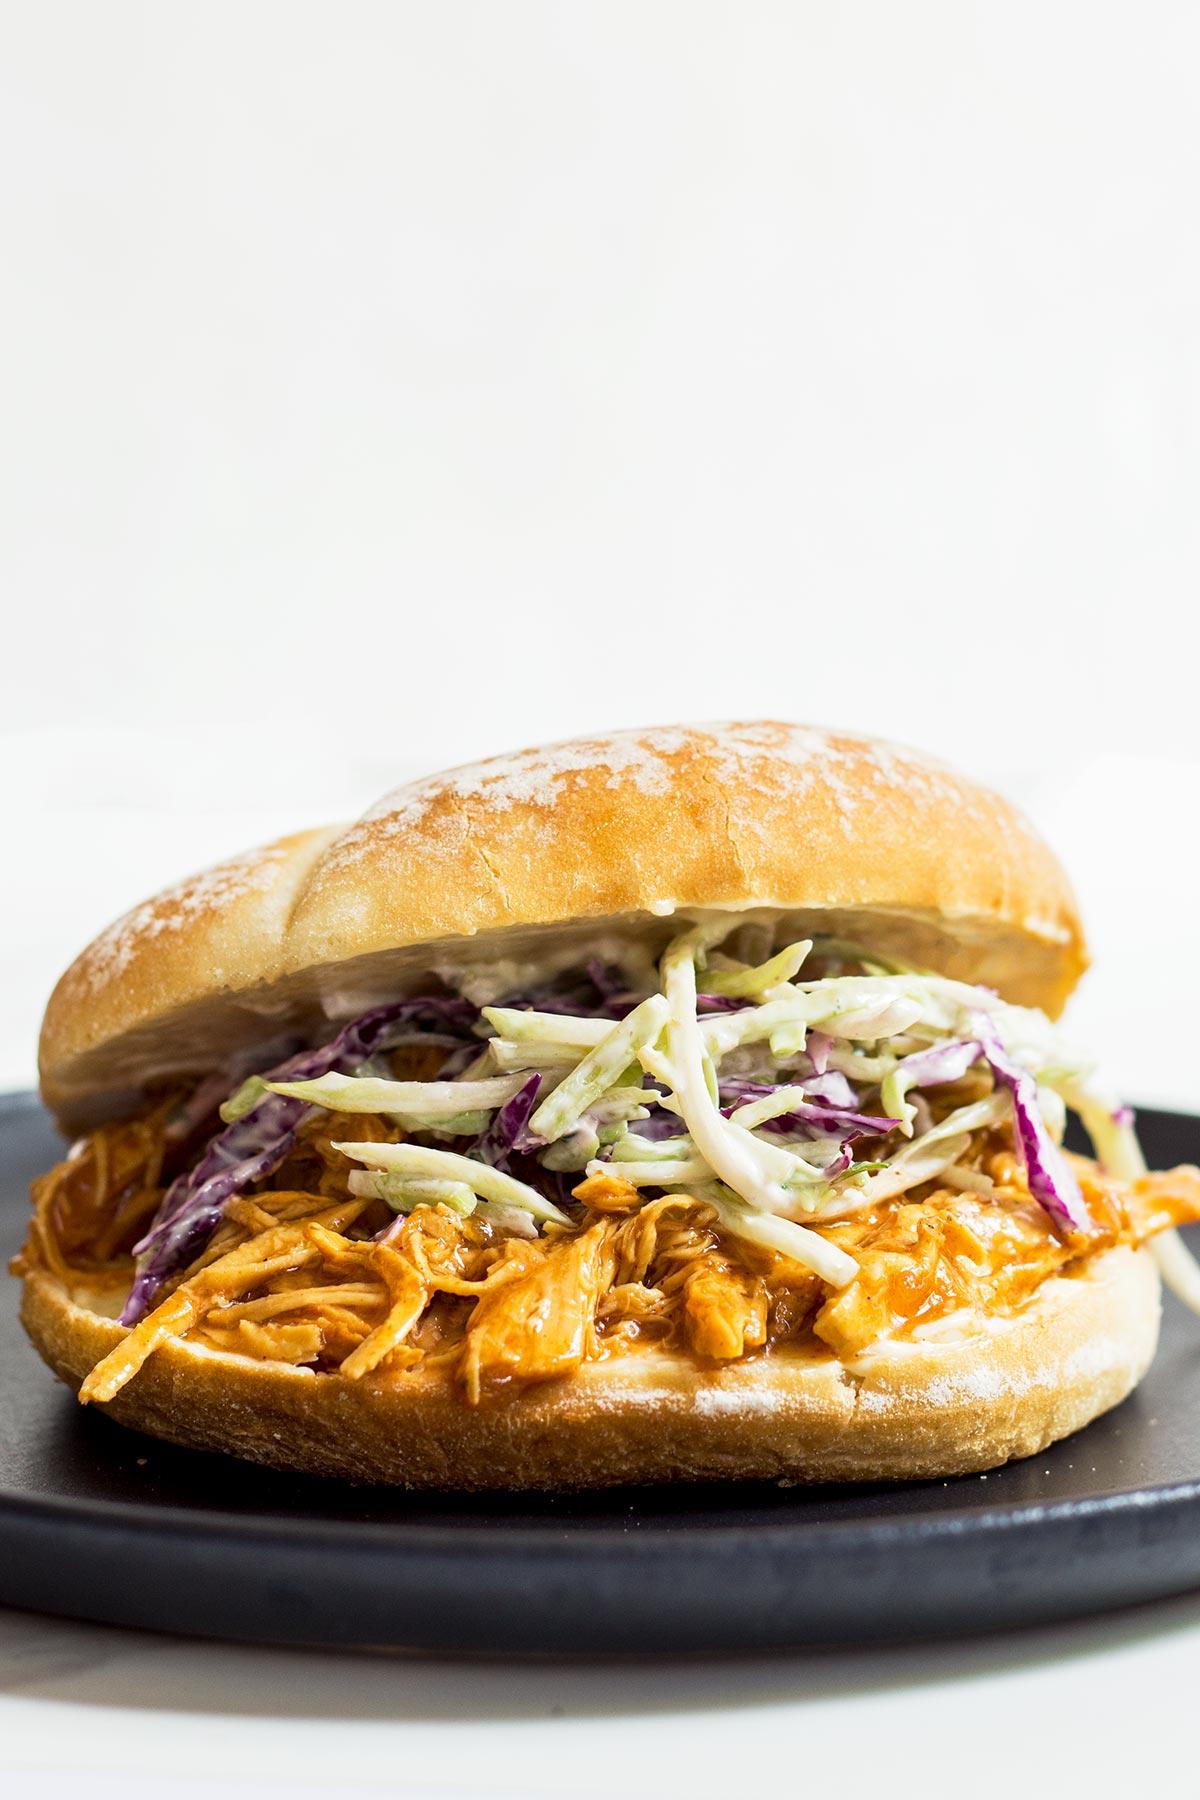 BBQ Shredded Chicken Sandwich